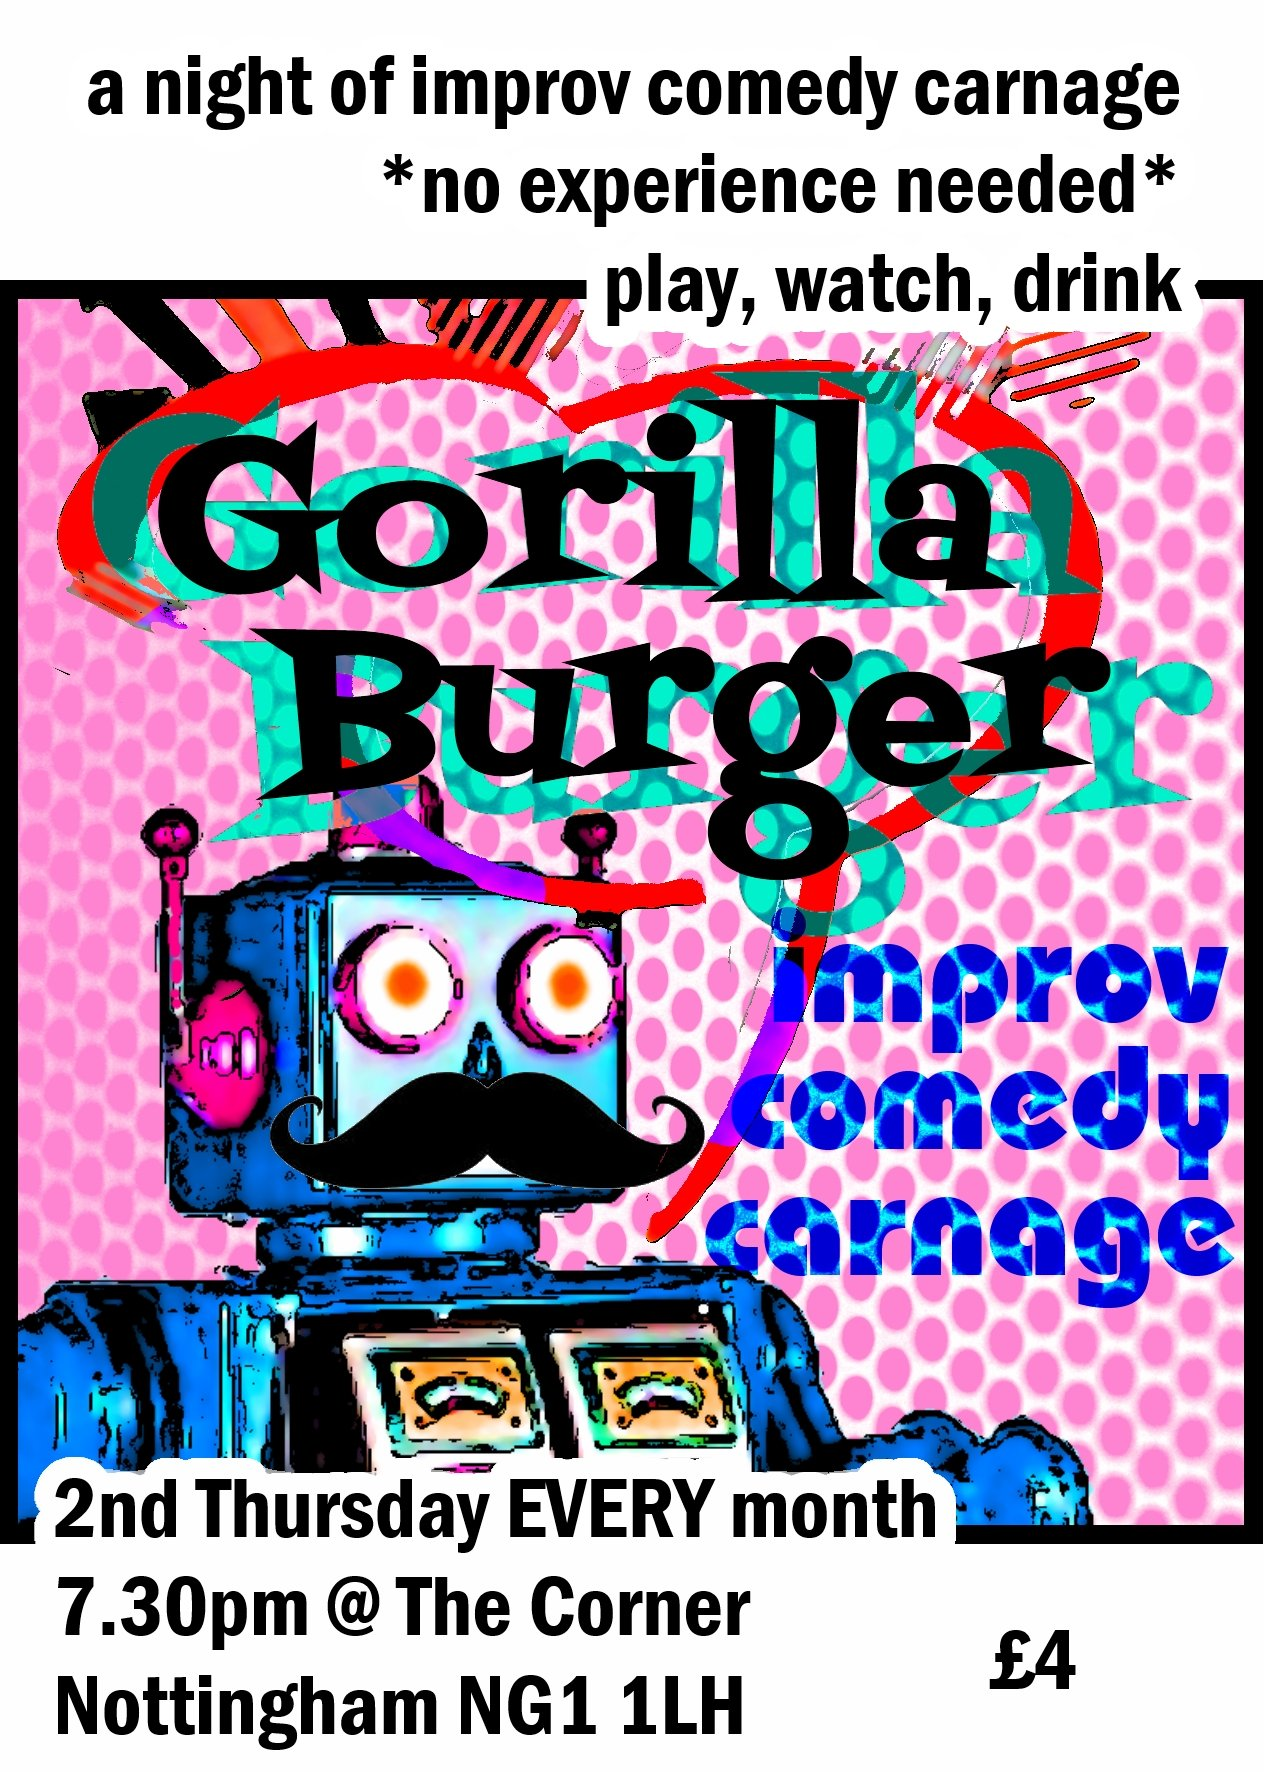 Gorilla Burgermovember